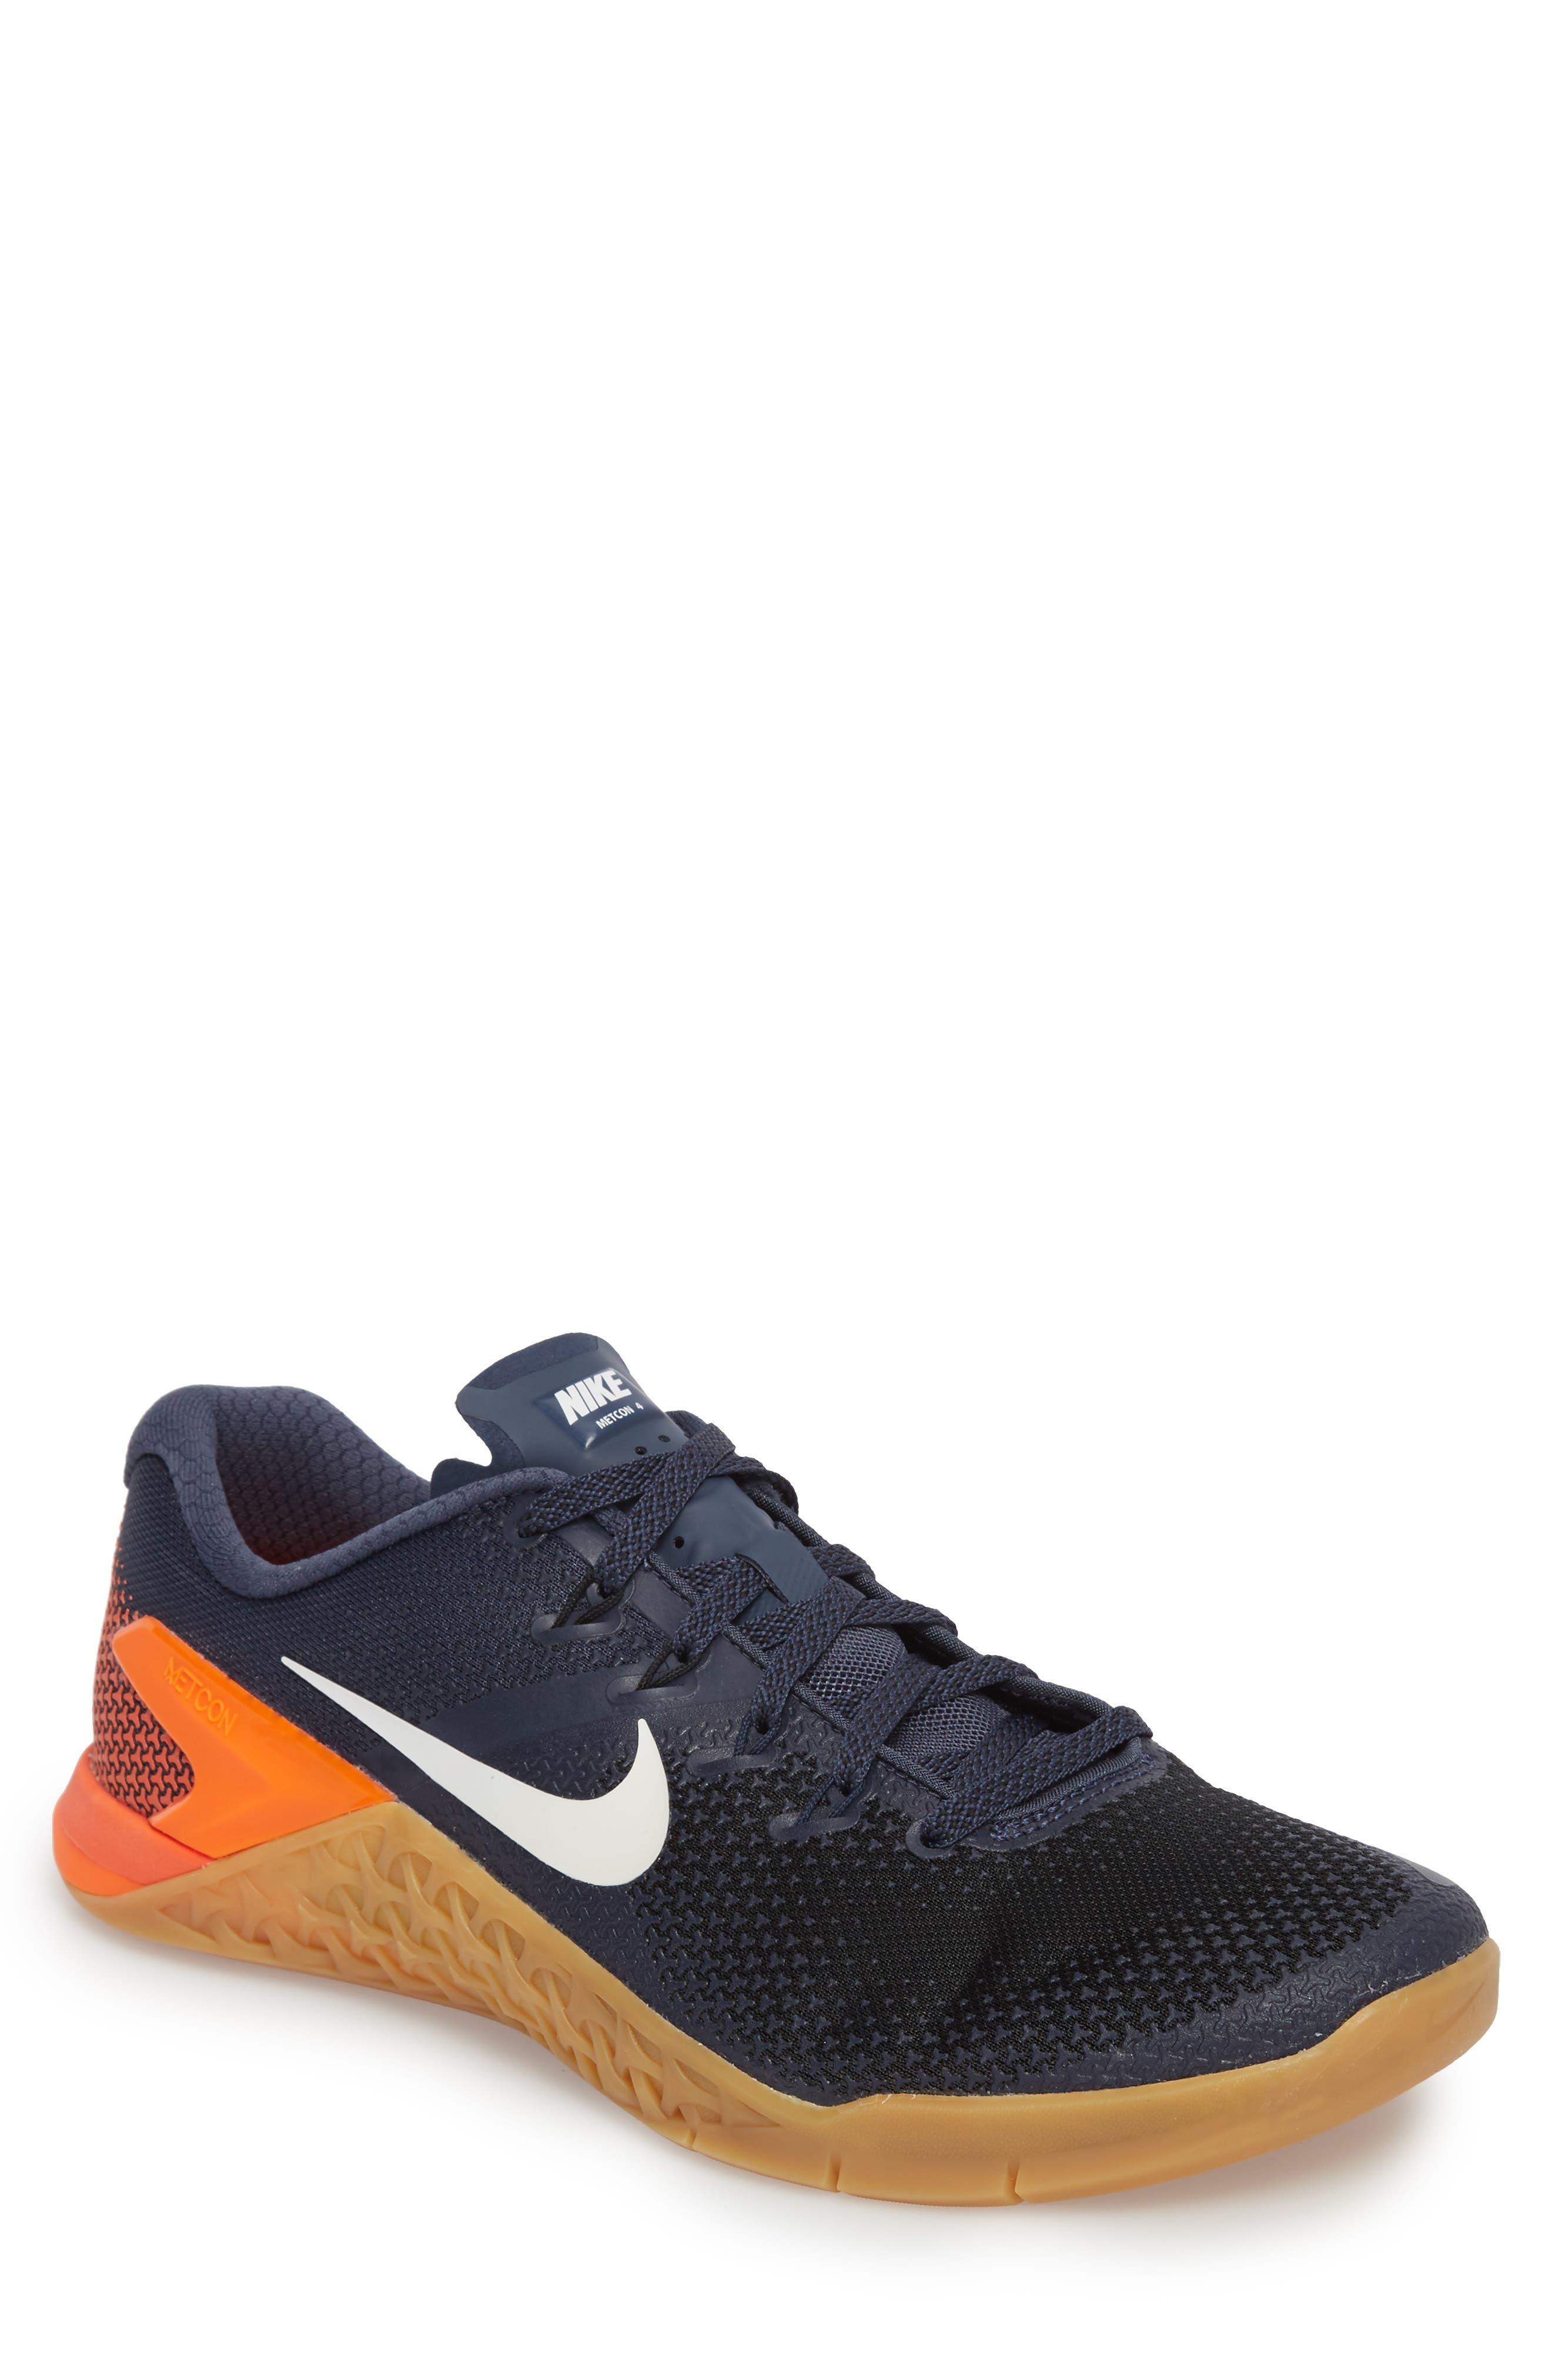 Metcon 4 Training Shoe,                             Main thumbnail 15, color,